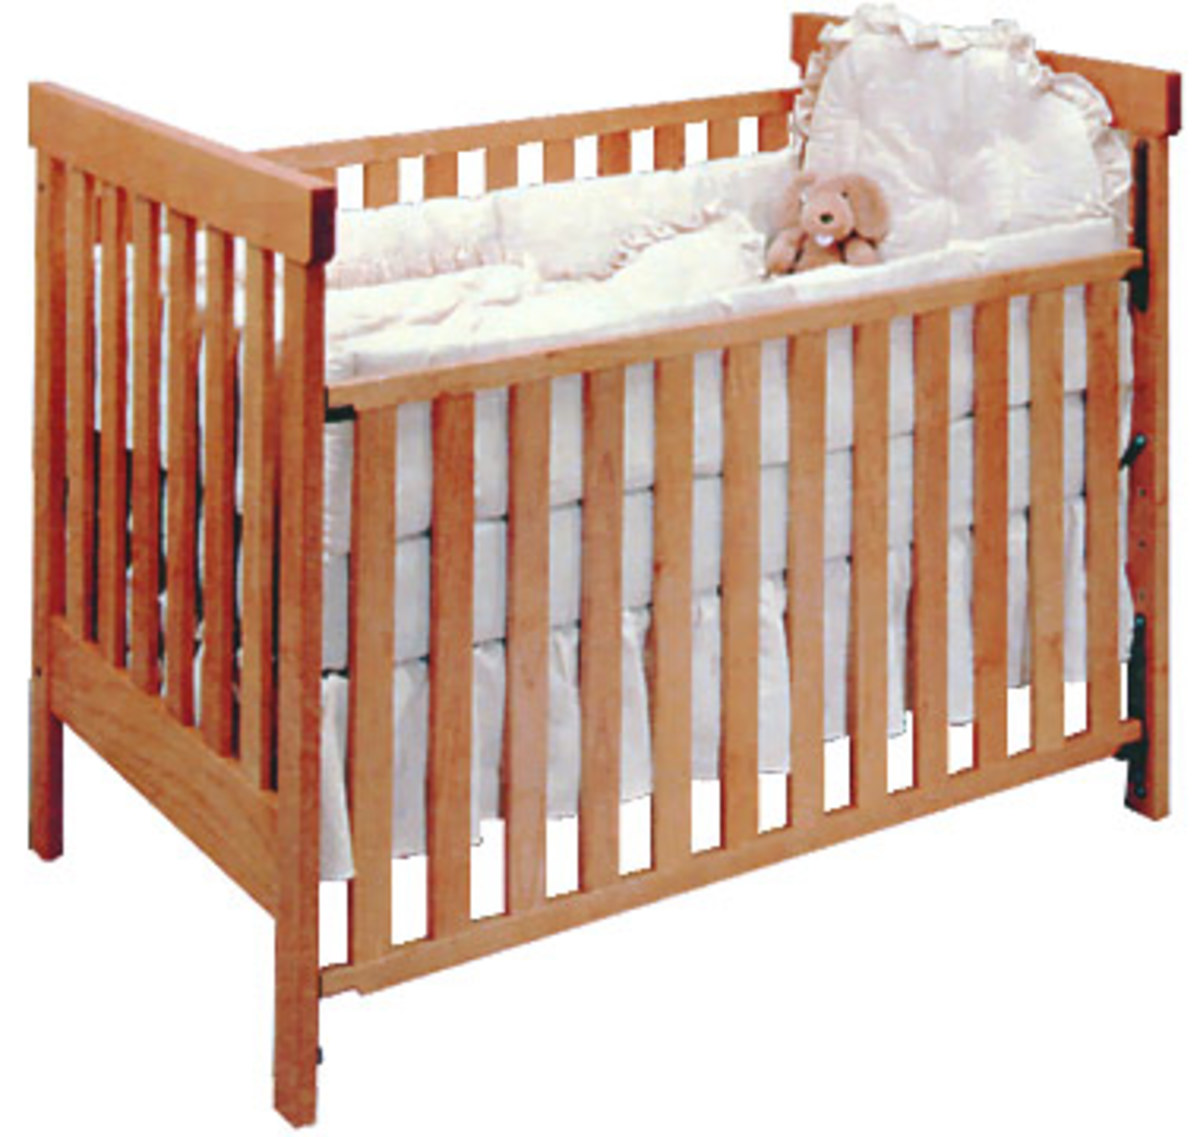 safe_crib